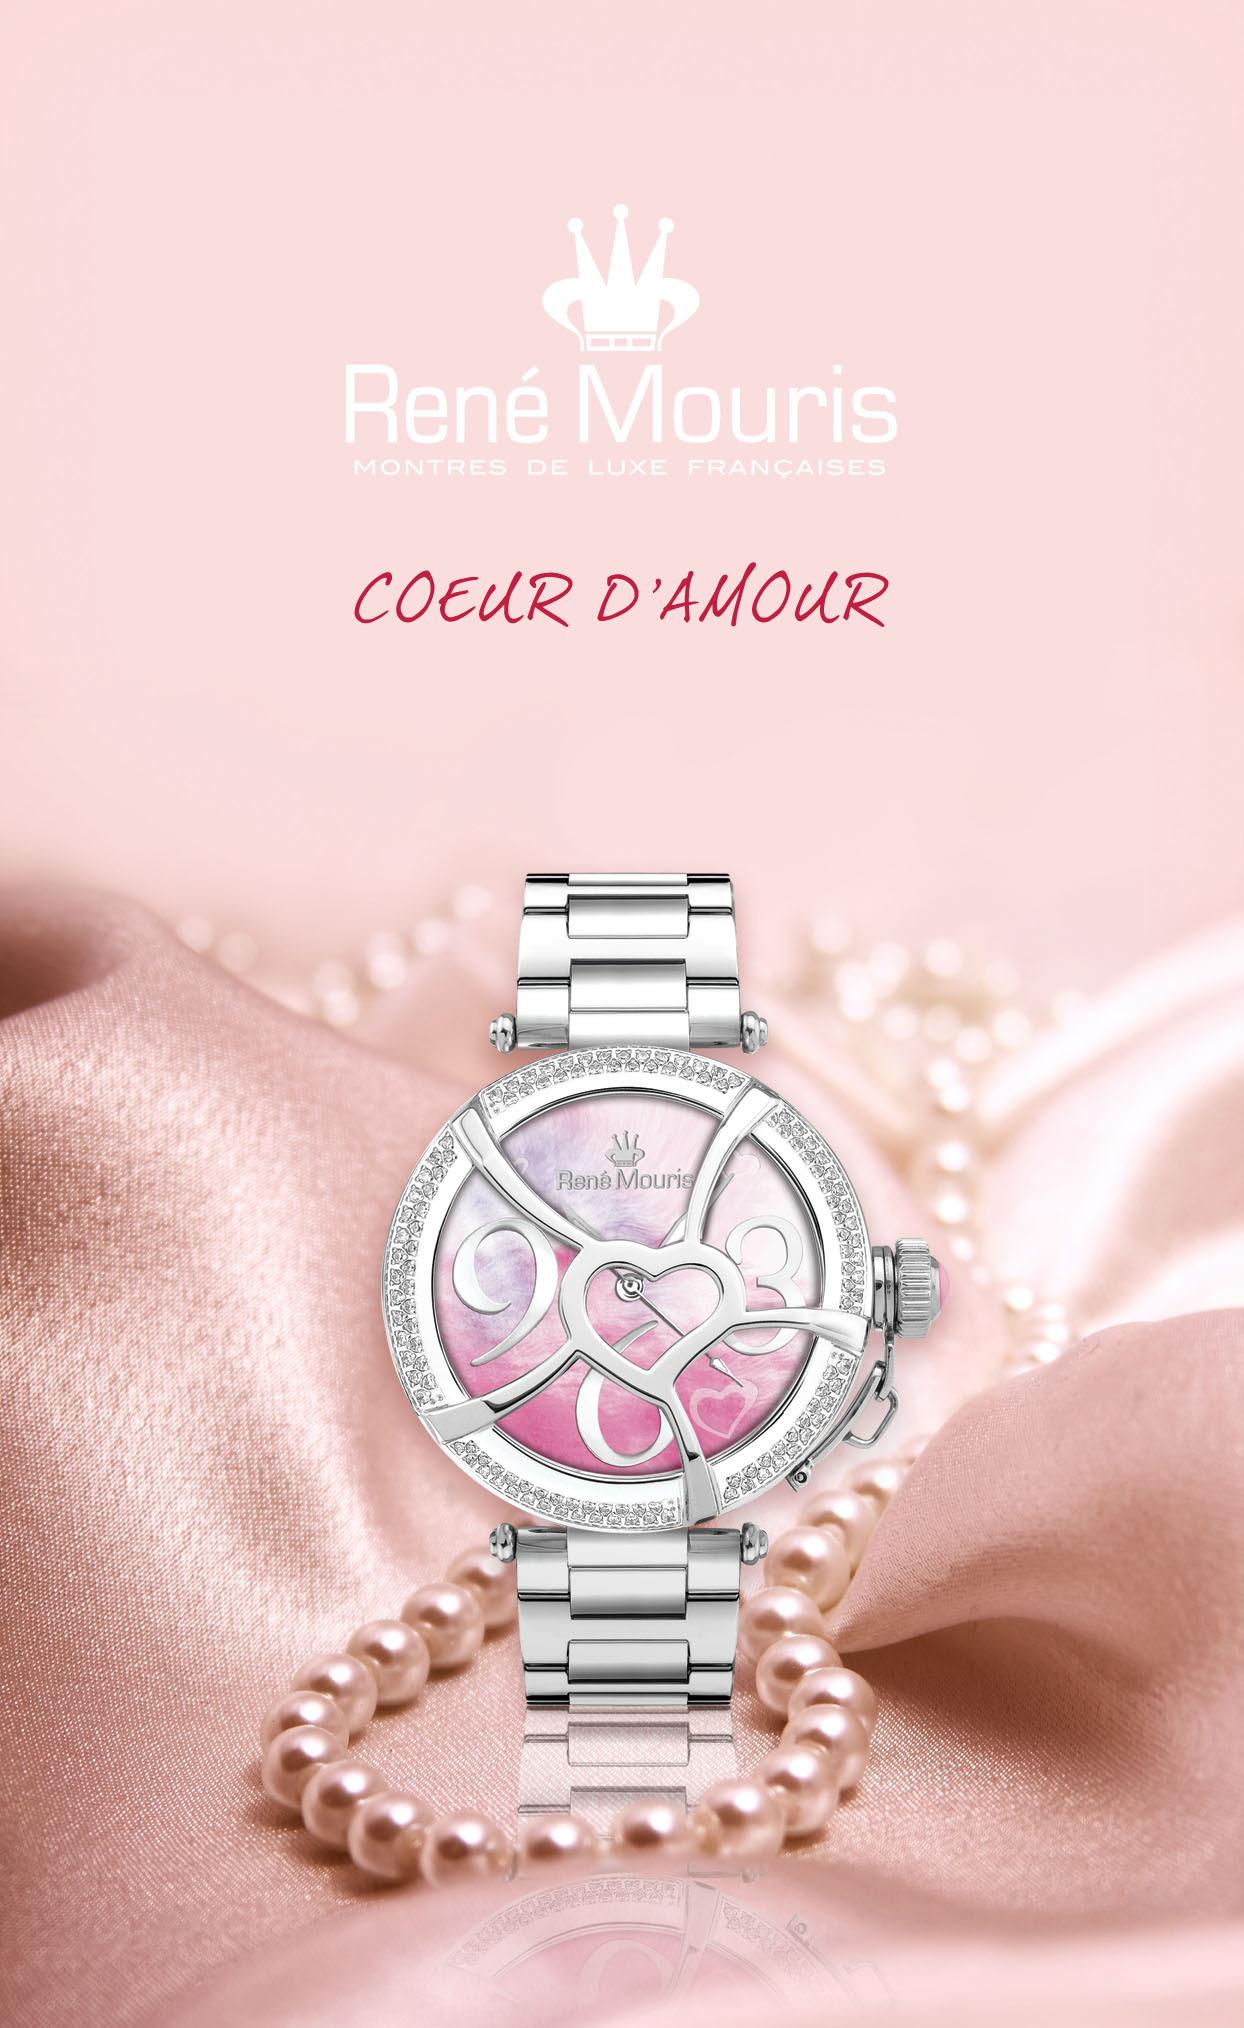 Rene Mouris - Fashion Watch - Coeur d'Amour - 50102RM2